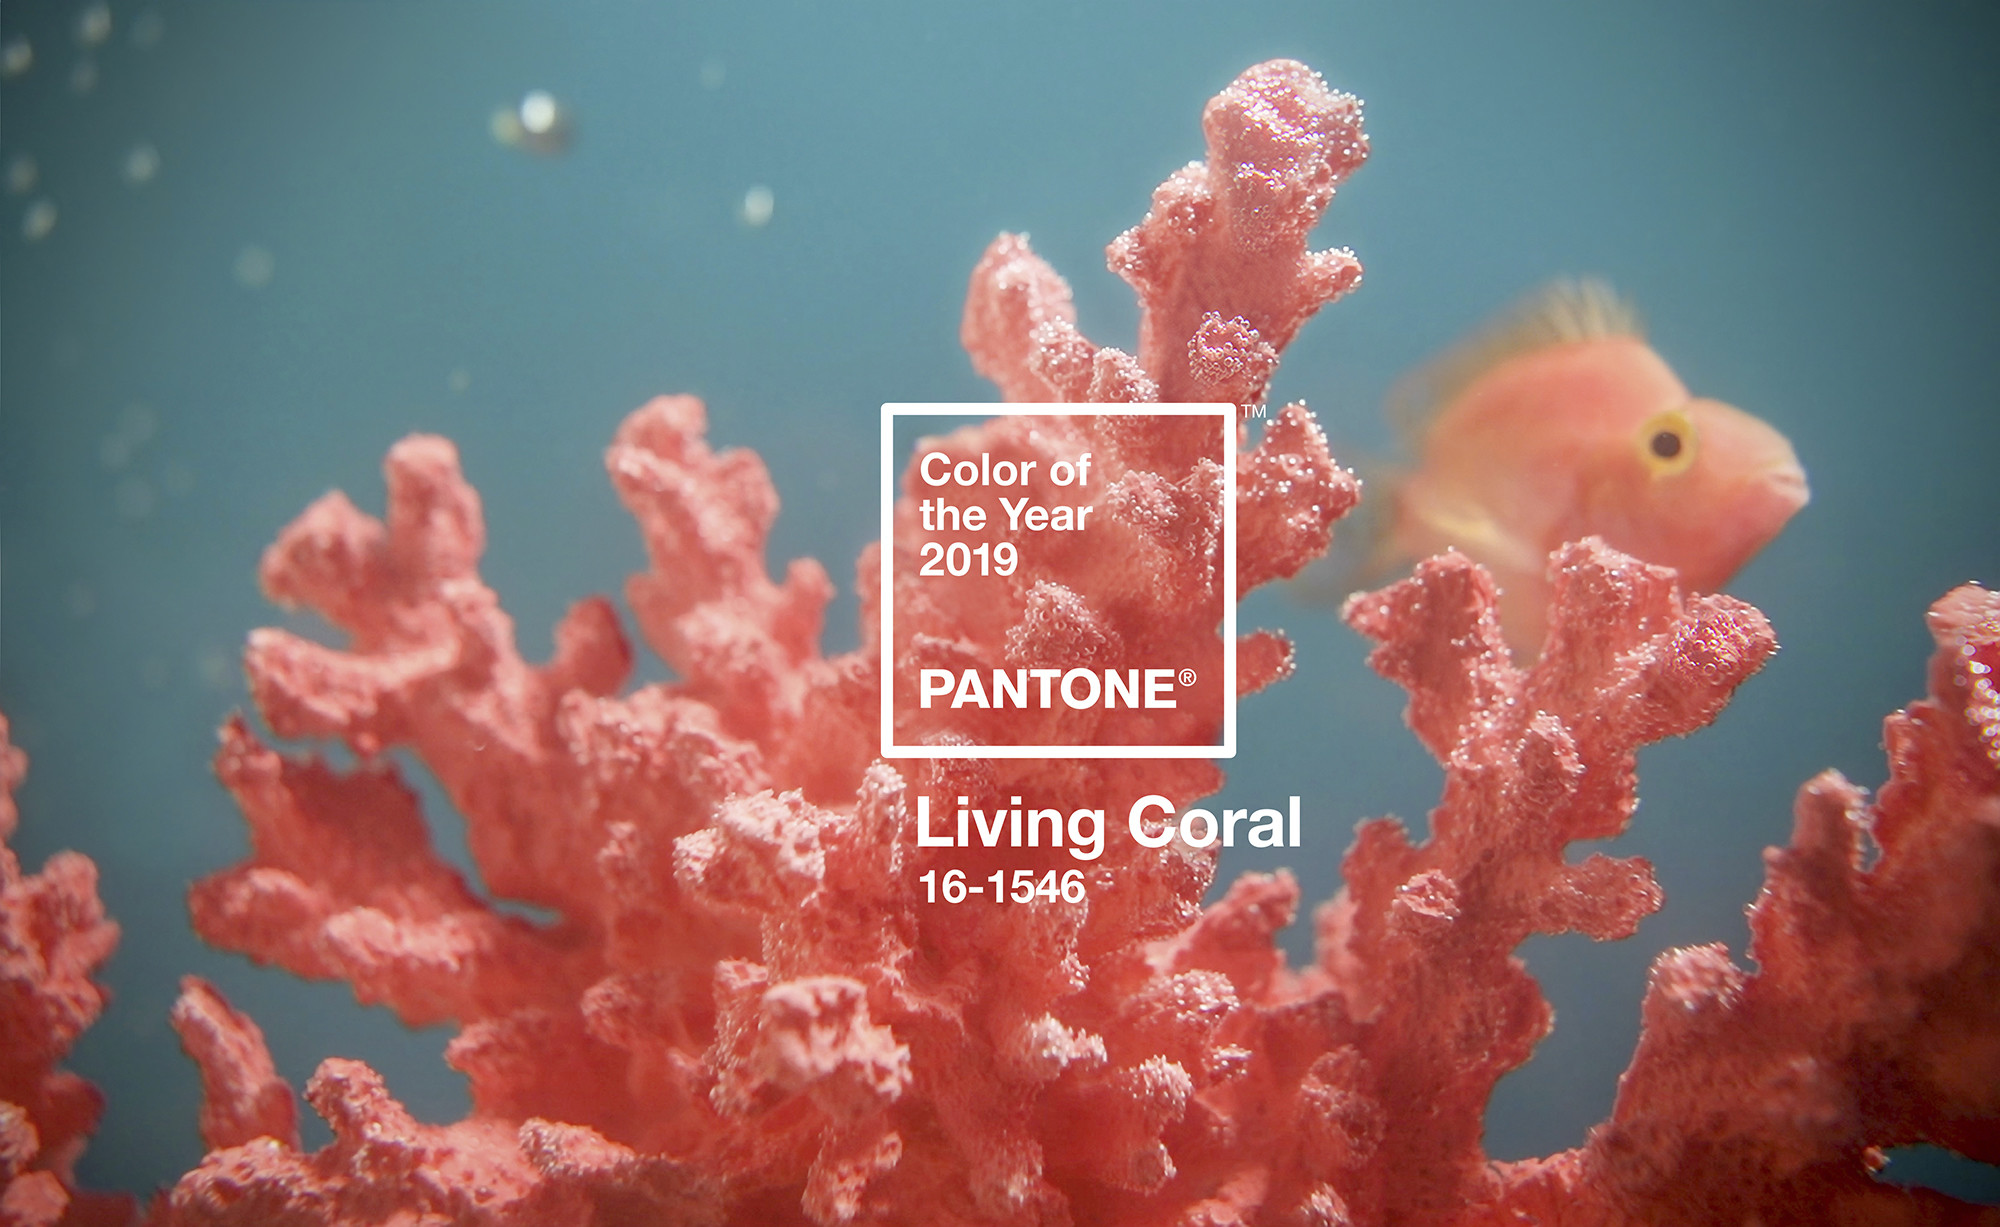 2019 Pantone living coral-鯊客科技SEO品牌經營